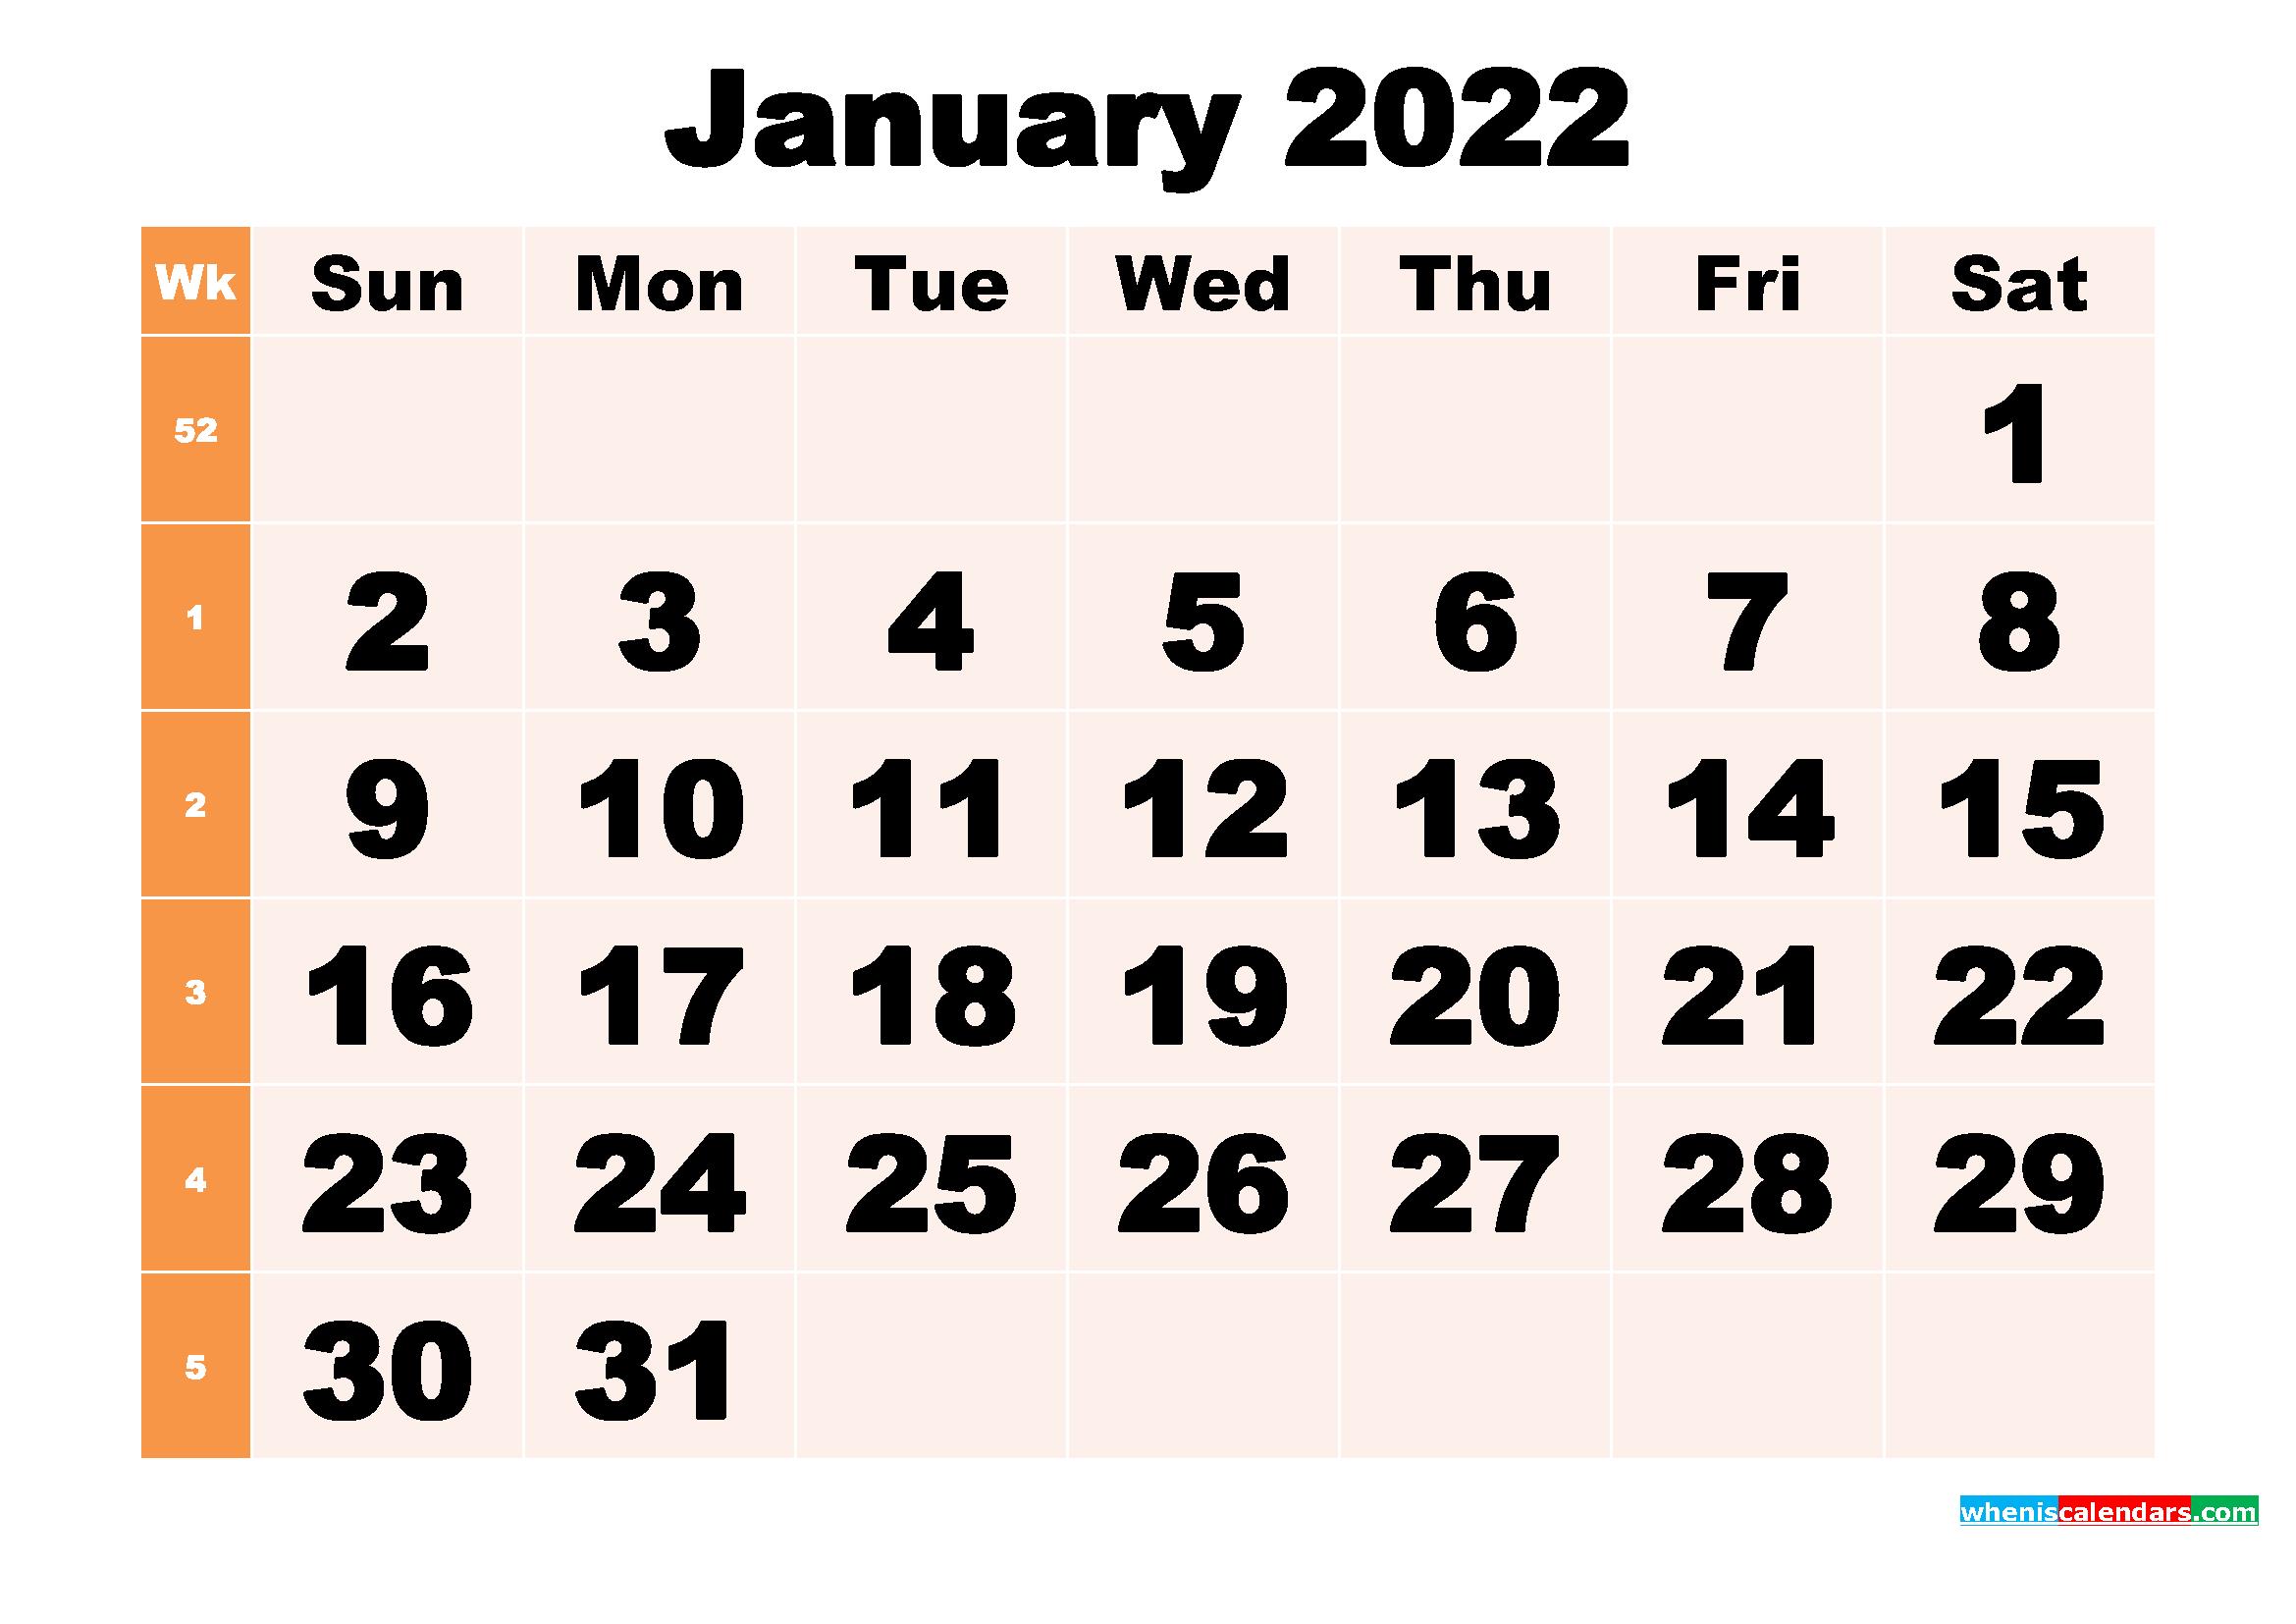 Free Printable January 2022 Calendar Template Word, Pdf For January Calendar 2022 Printable